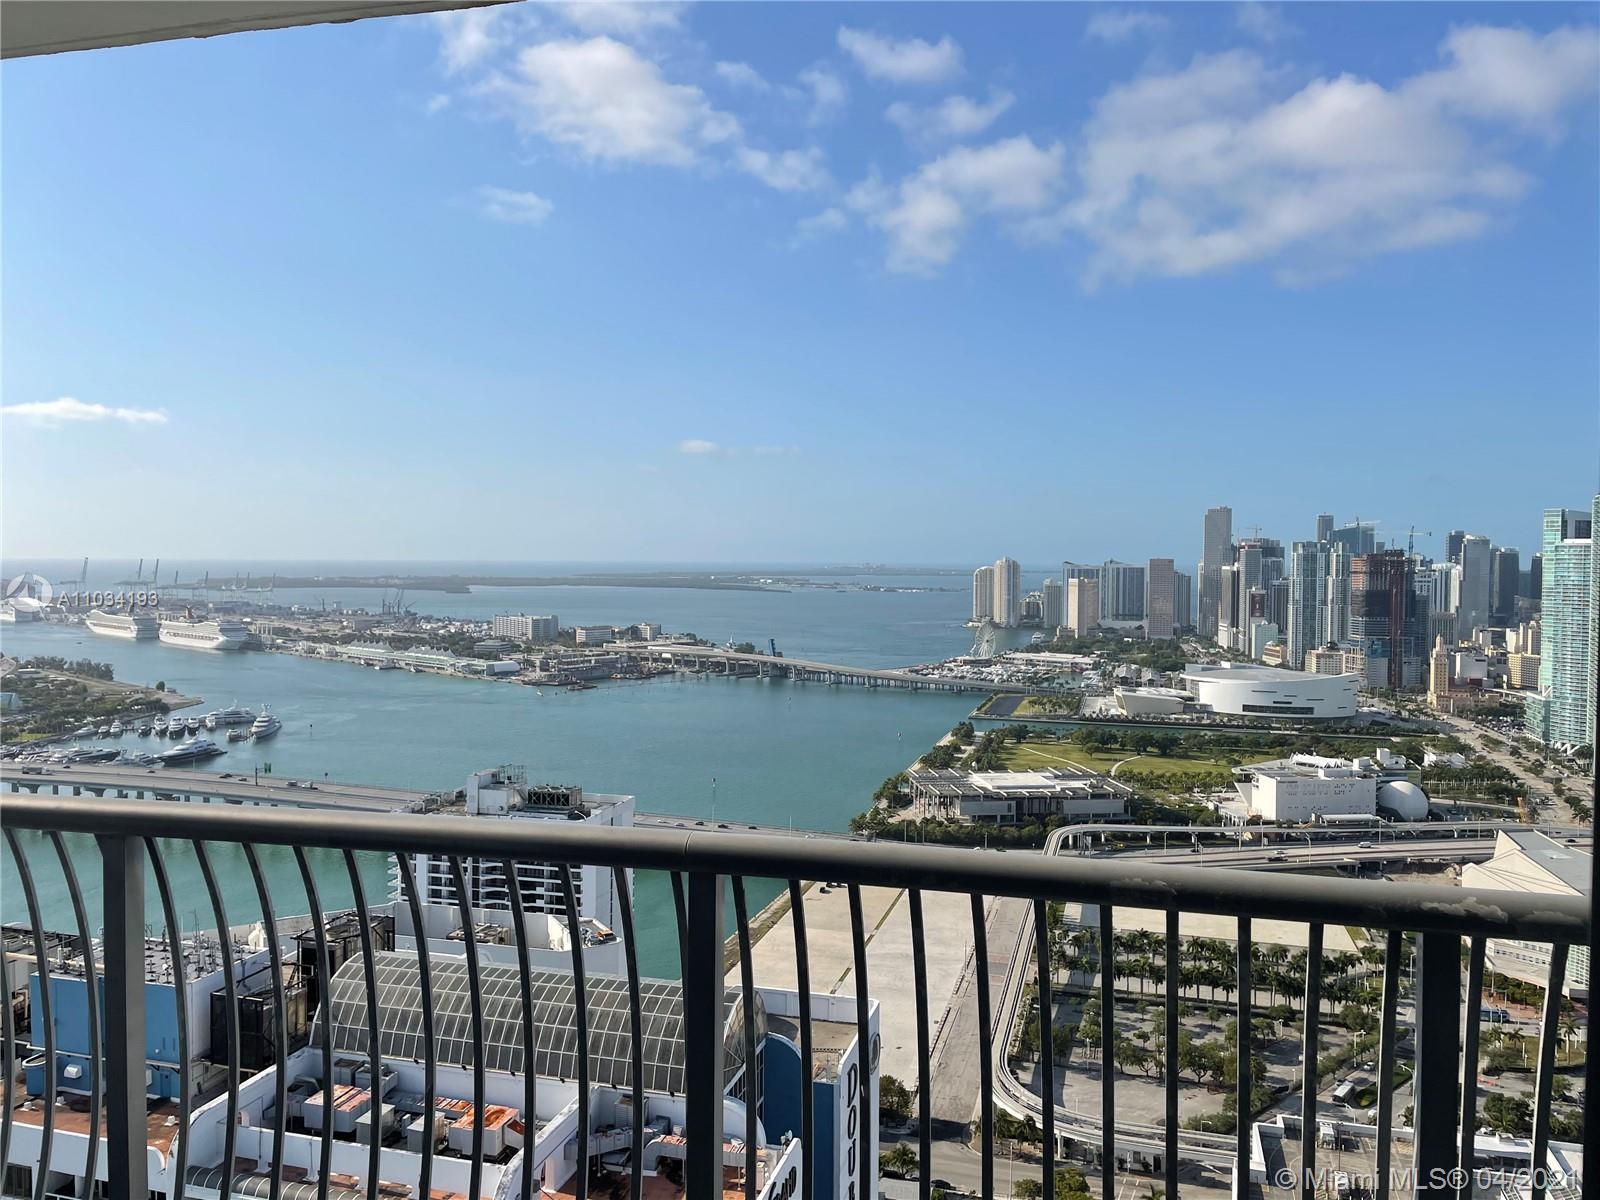 Opera Tower #5408 - 1750 N Bayshore Dr #5408, Miami, FL 33132